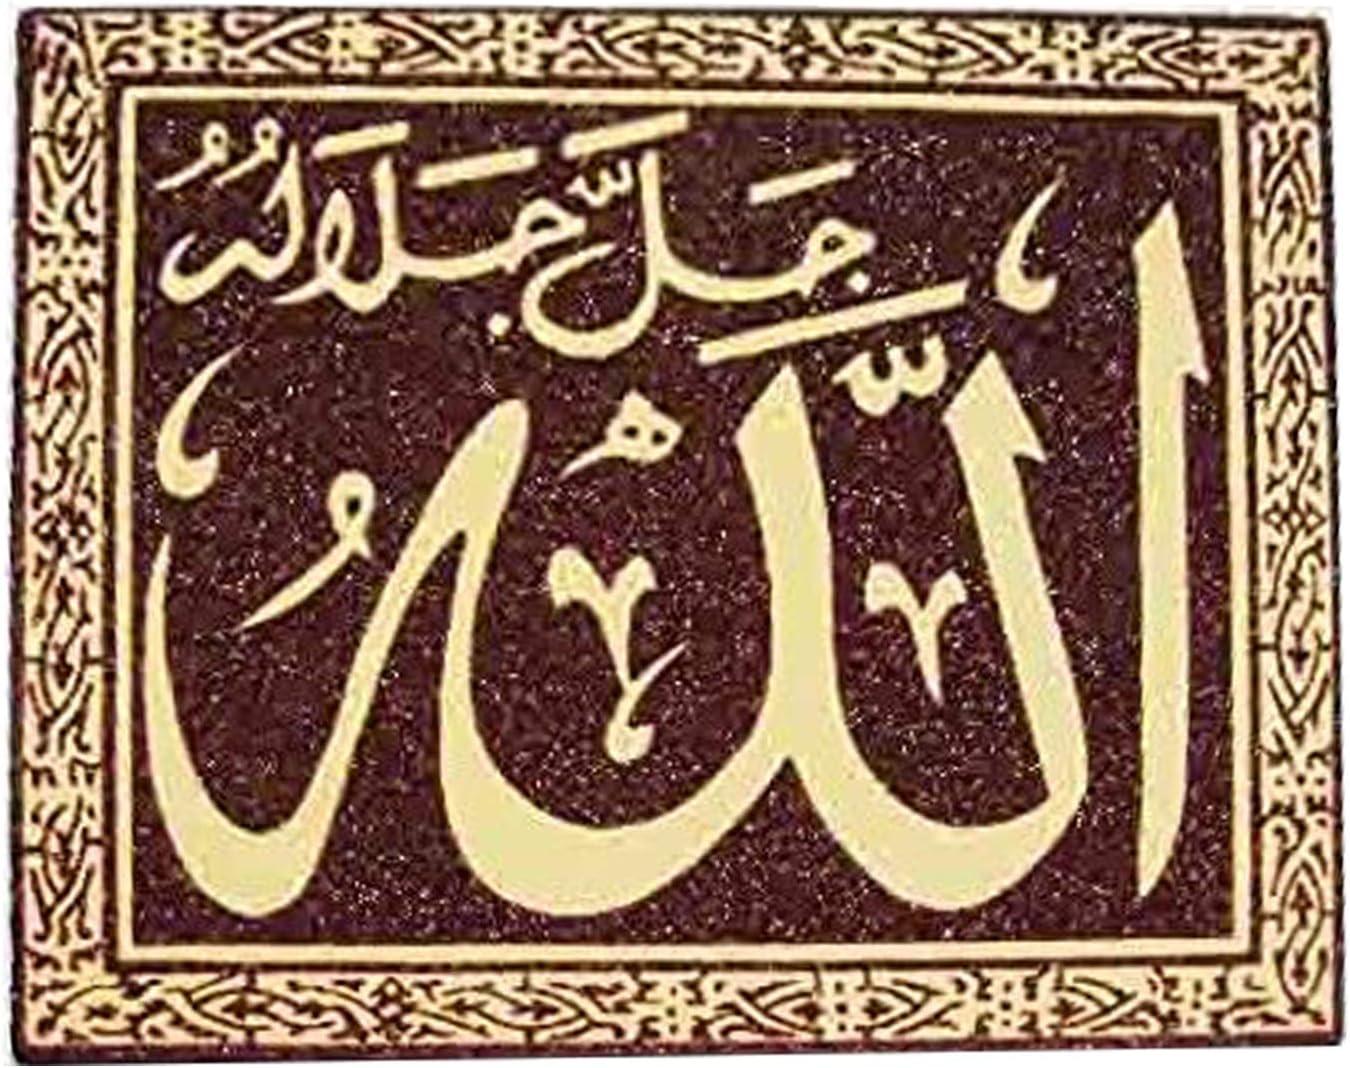 100/% Egyptian Wooden Engraved Framed ًWith Shiny Glitter Islamic Islam Arabic Quran Koran Calligraphy Wall Hanging Frame Handmade Egypt 9.4 X 8 Mosque Home Decor Surah Allah Decor Decorative